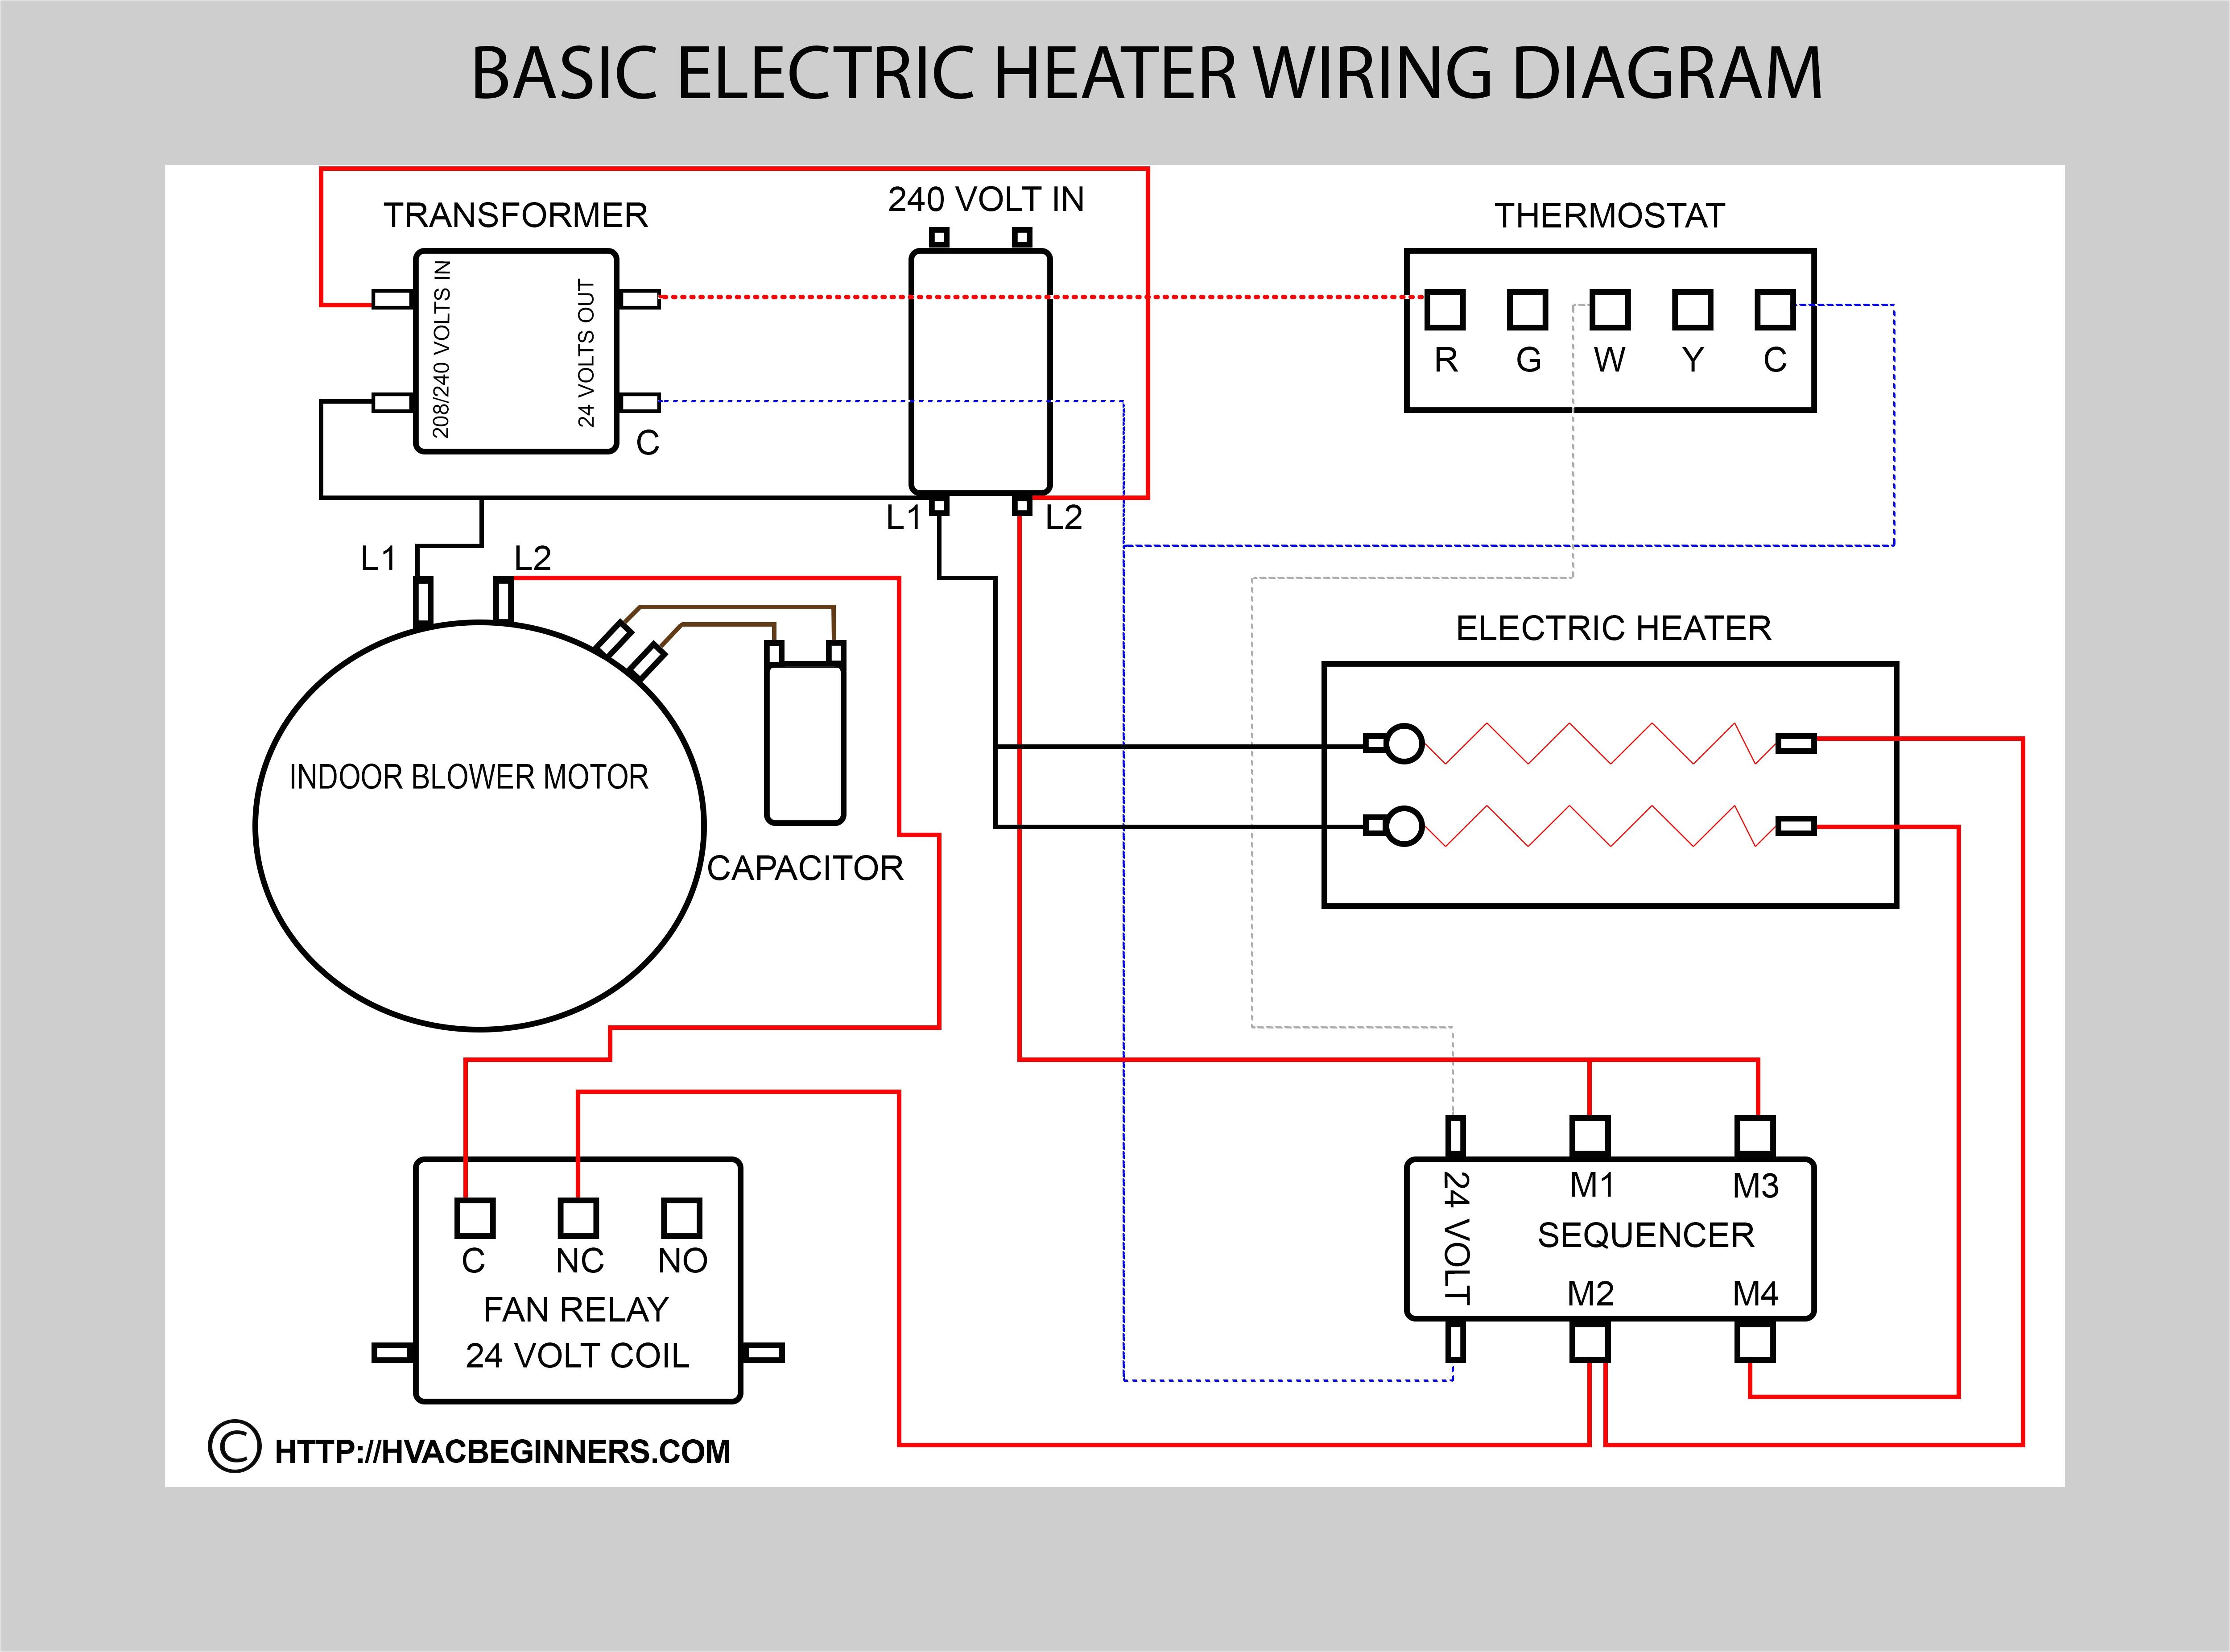 honeywell diagram wiring thermostat ct51n wiring diagram ct410b wiring diagram wiring diagram honeywell diagram wiring thermostat